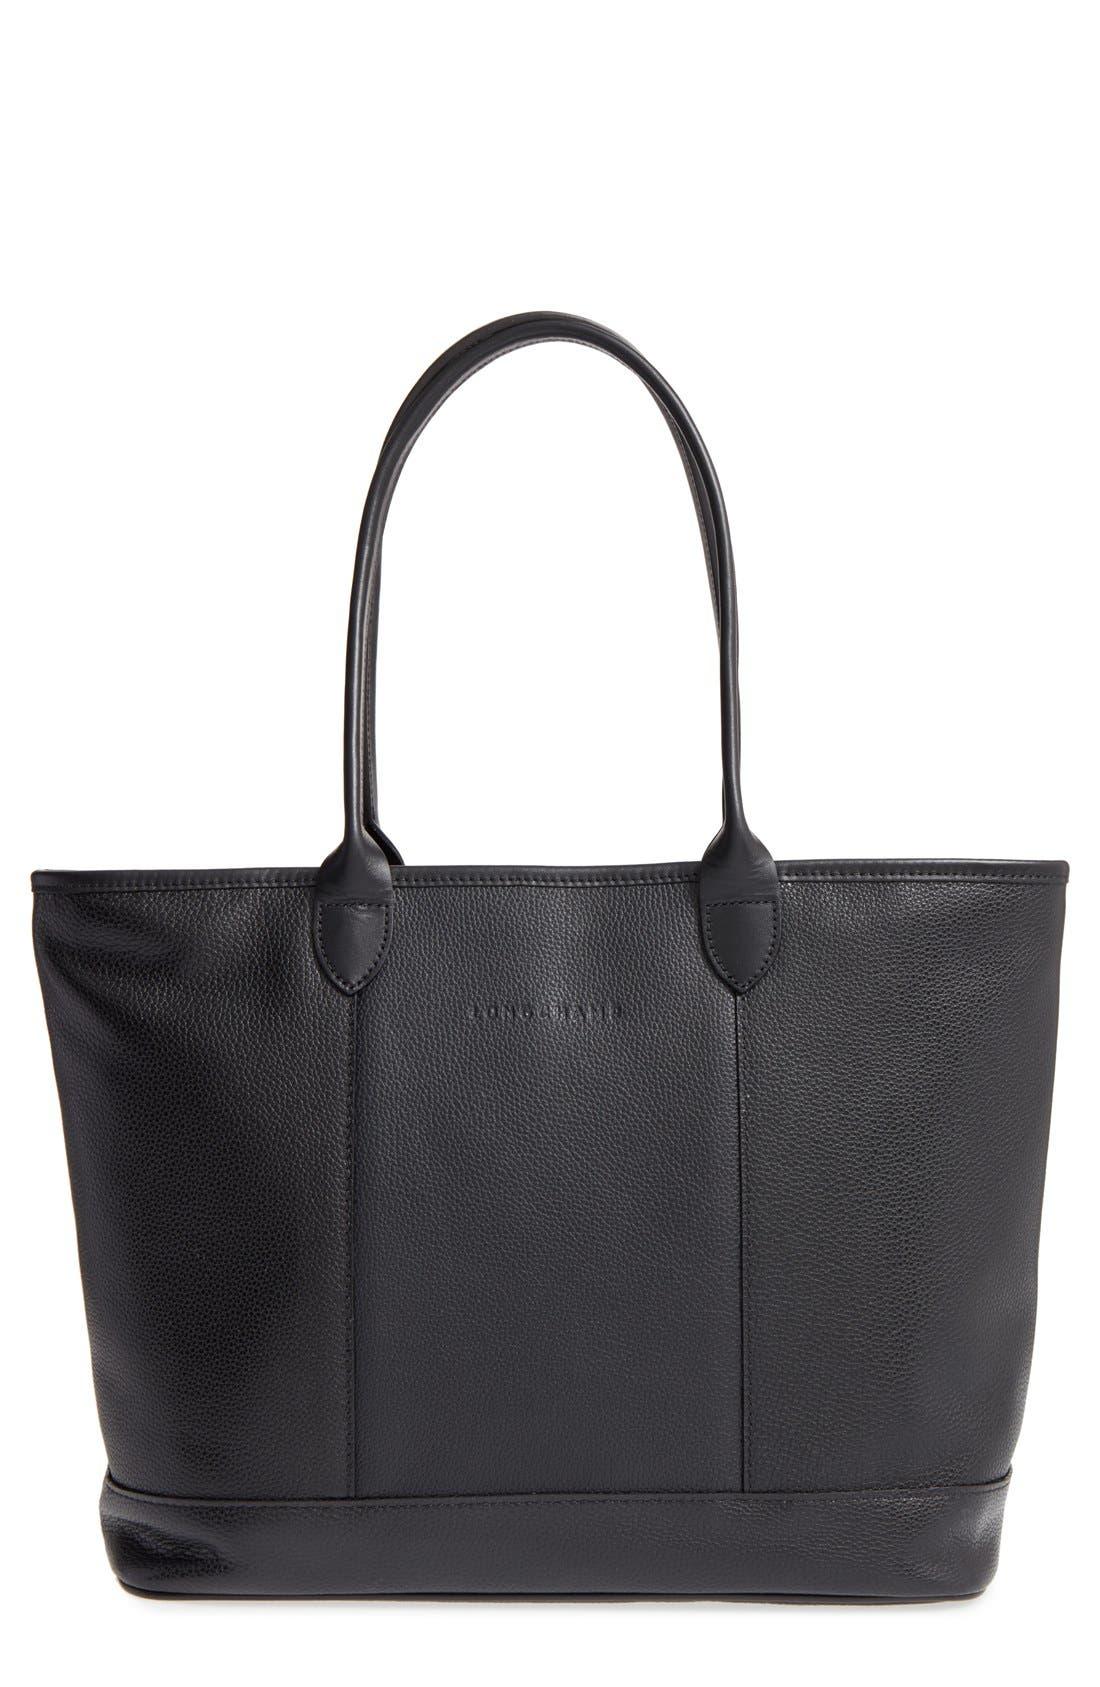 Longchamp 'Veau' Leather Tote